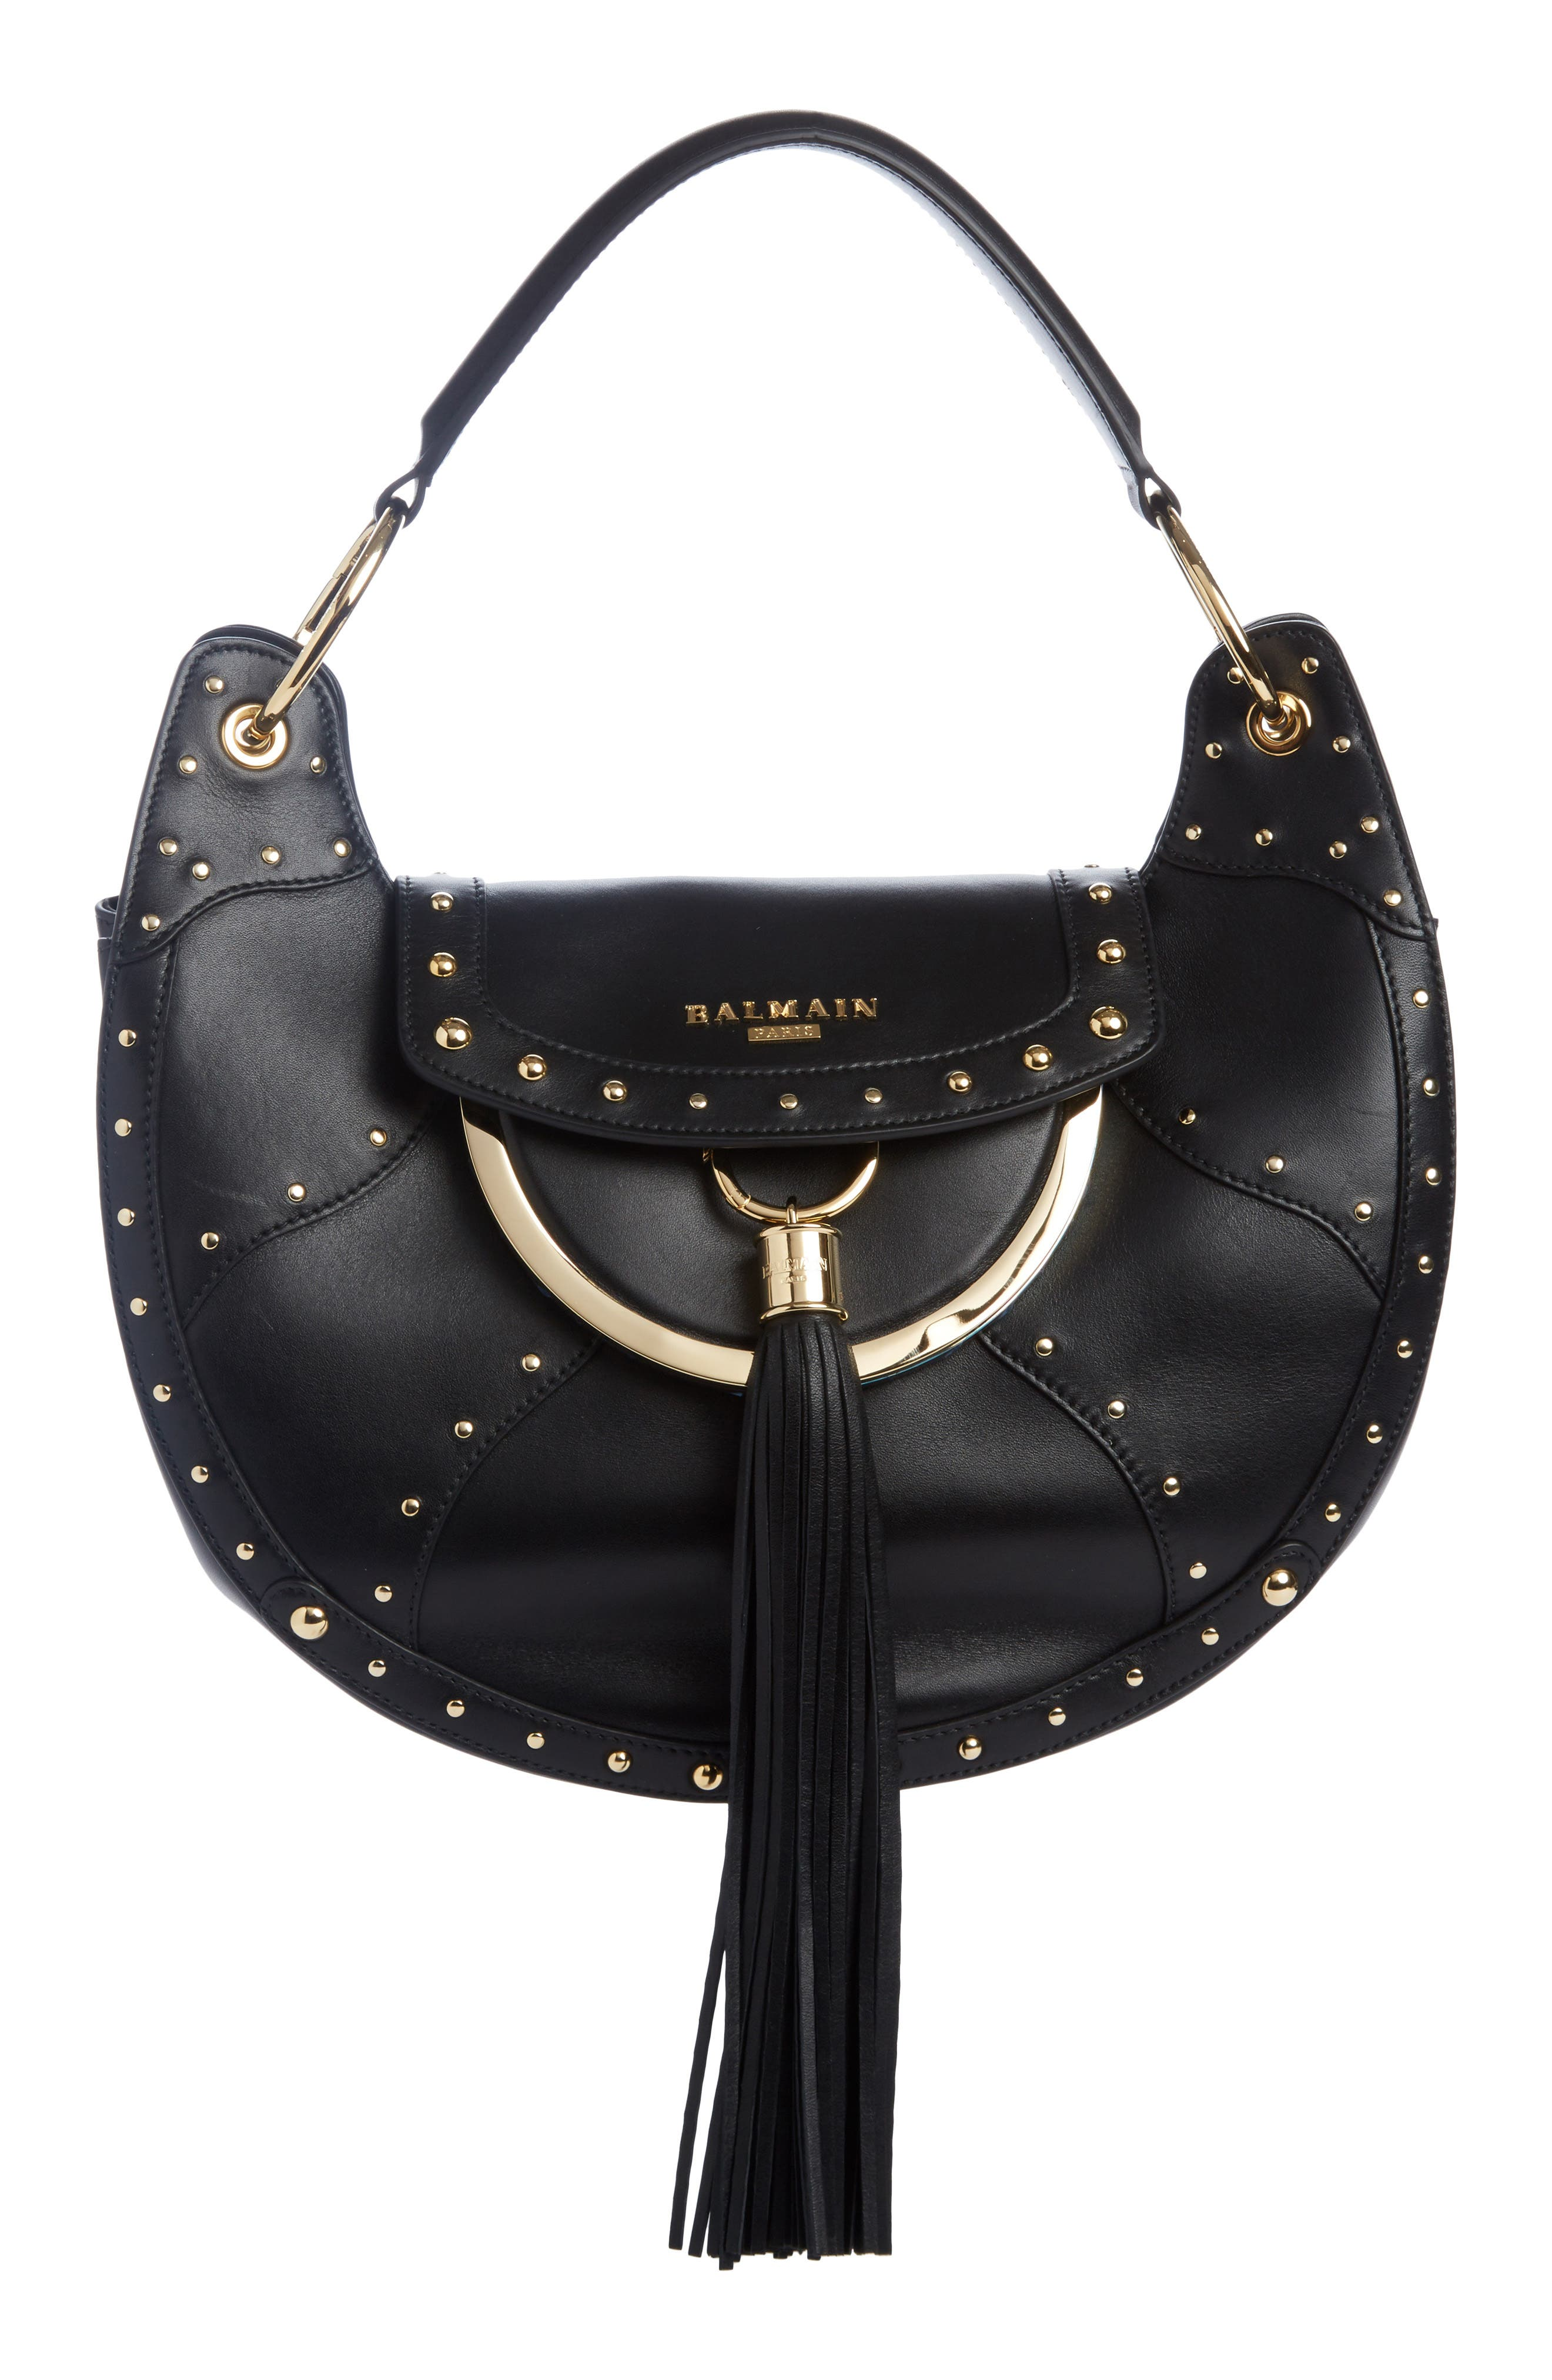 Alternate Image 1 Selected - Balmain Domaine Full Moon Leather Shoulder Bag